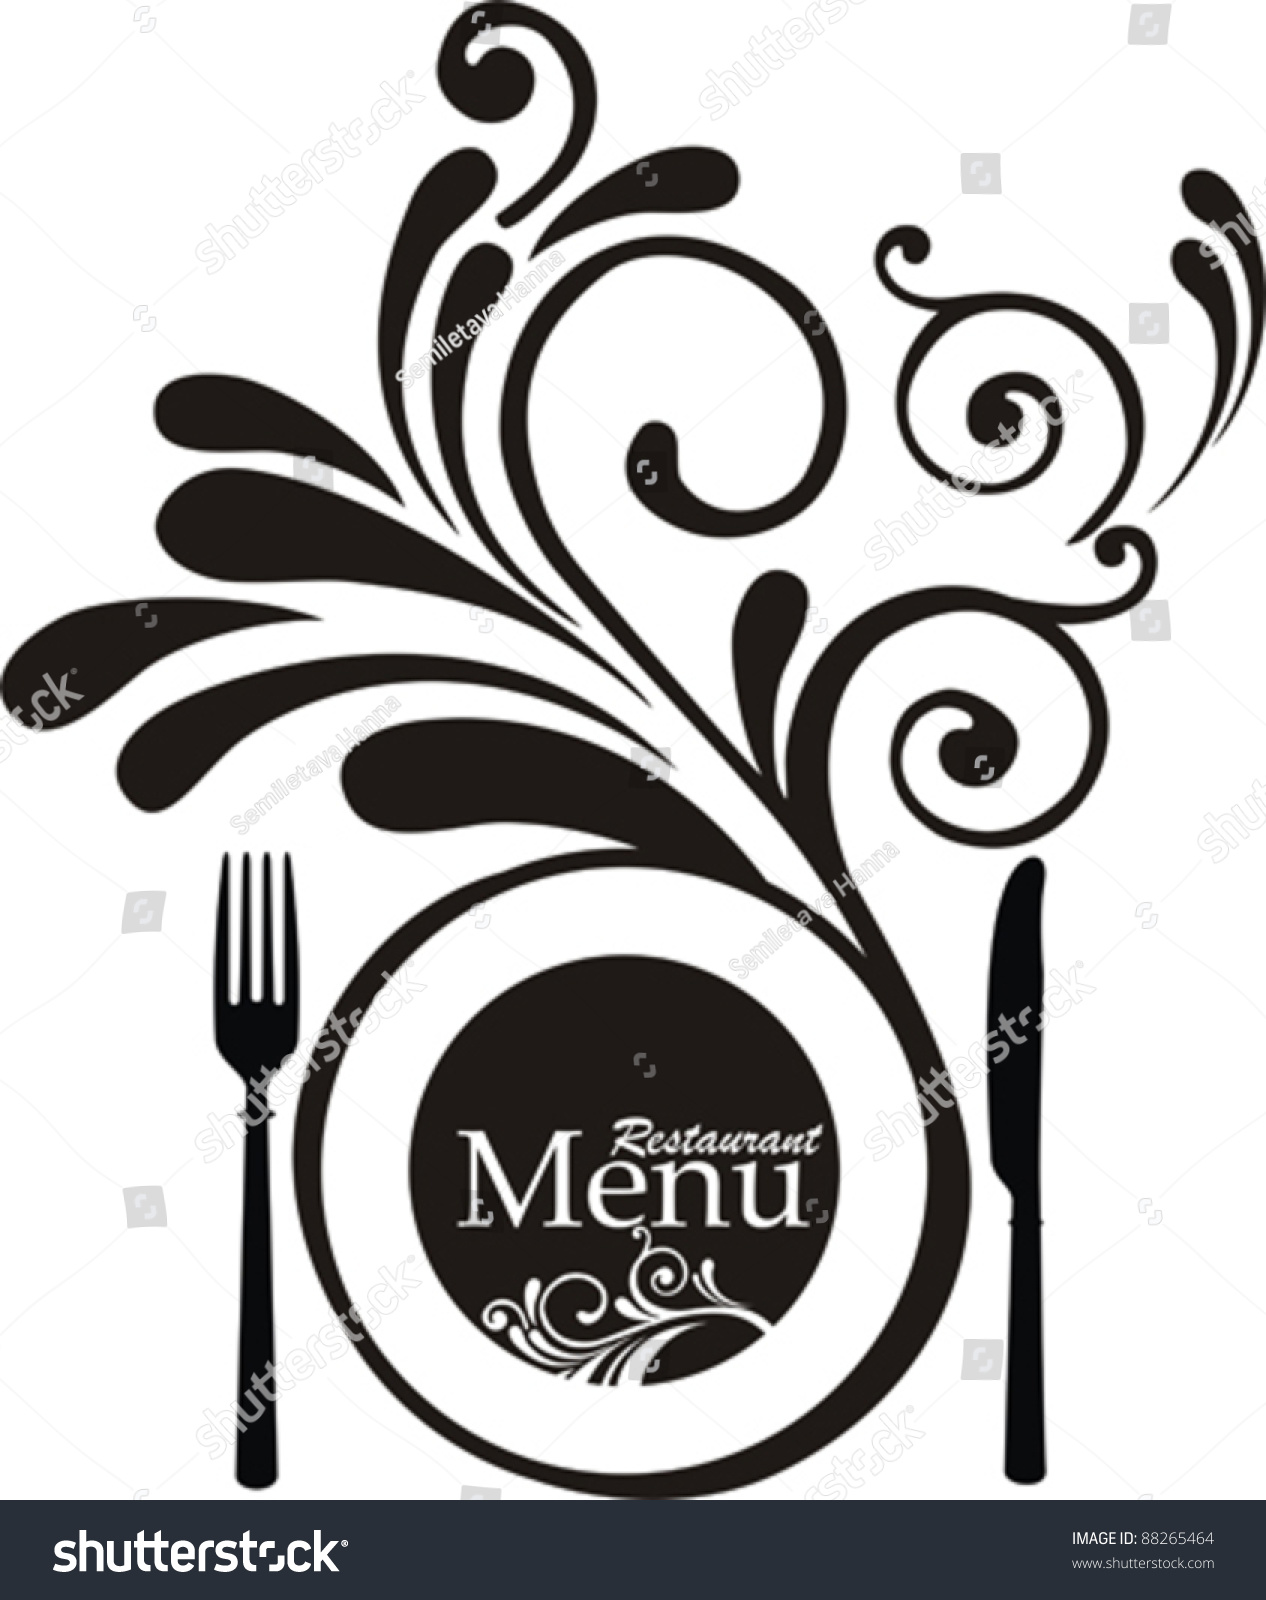 Vintage restaurant menu design elements isolated on white